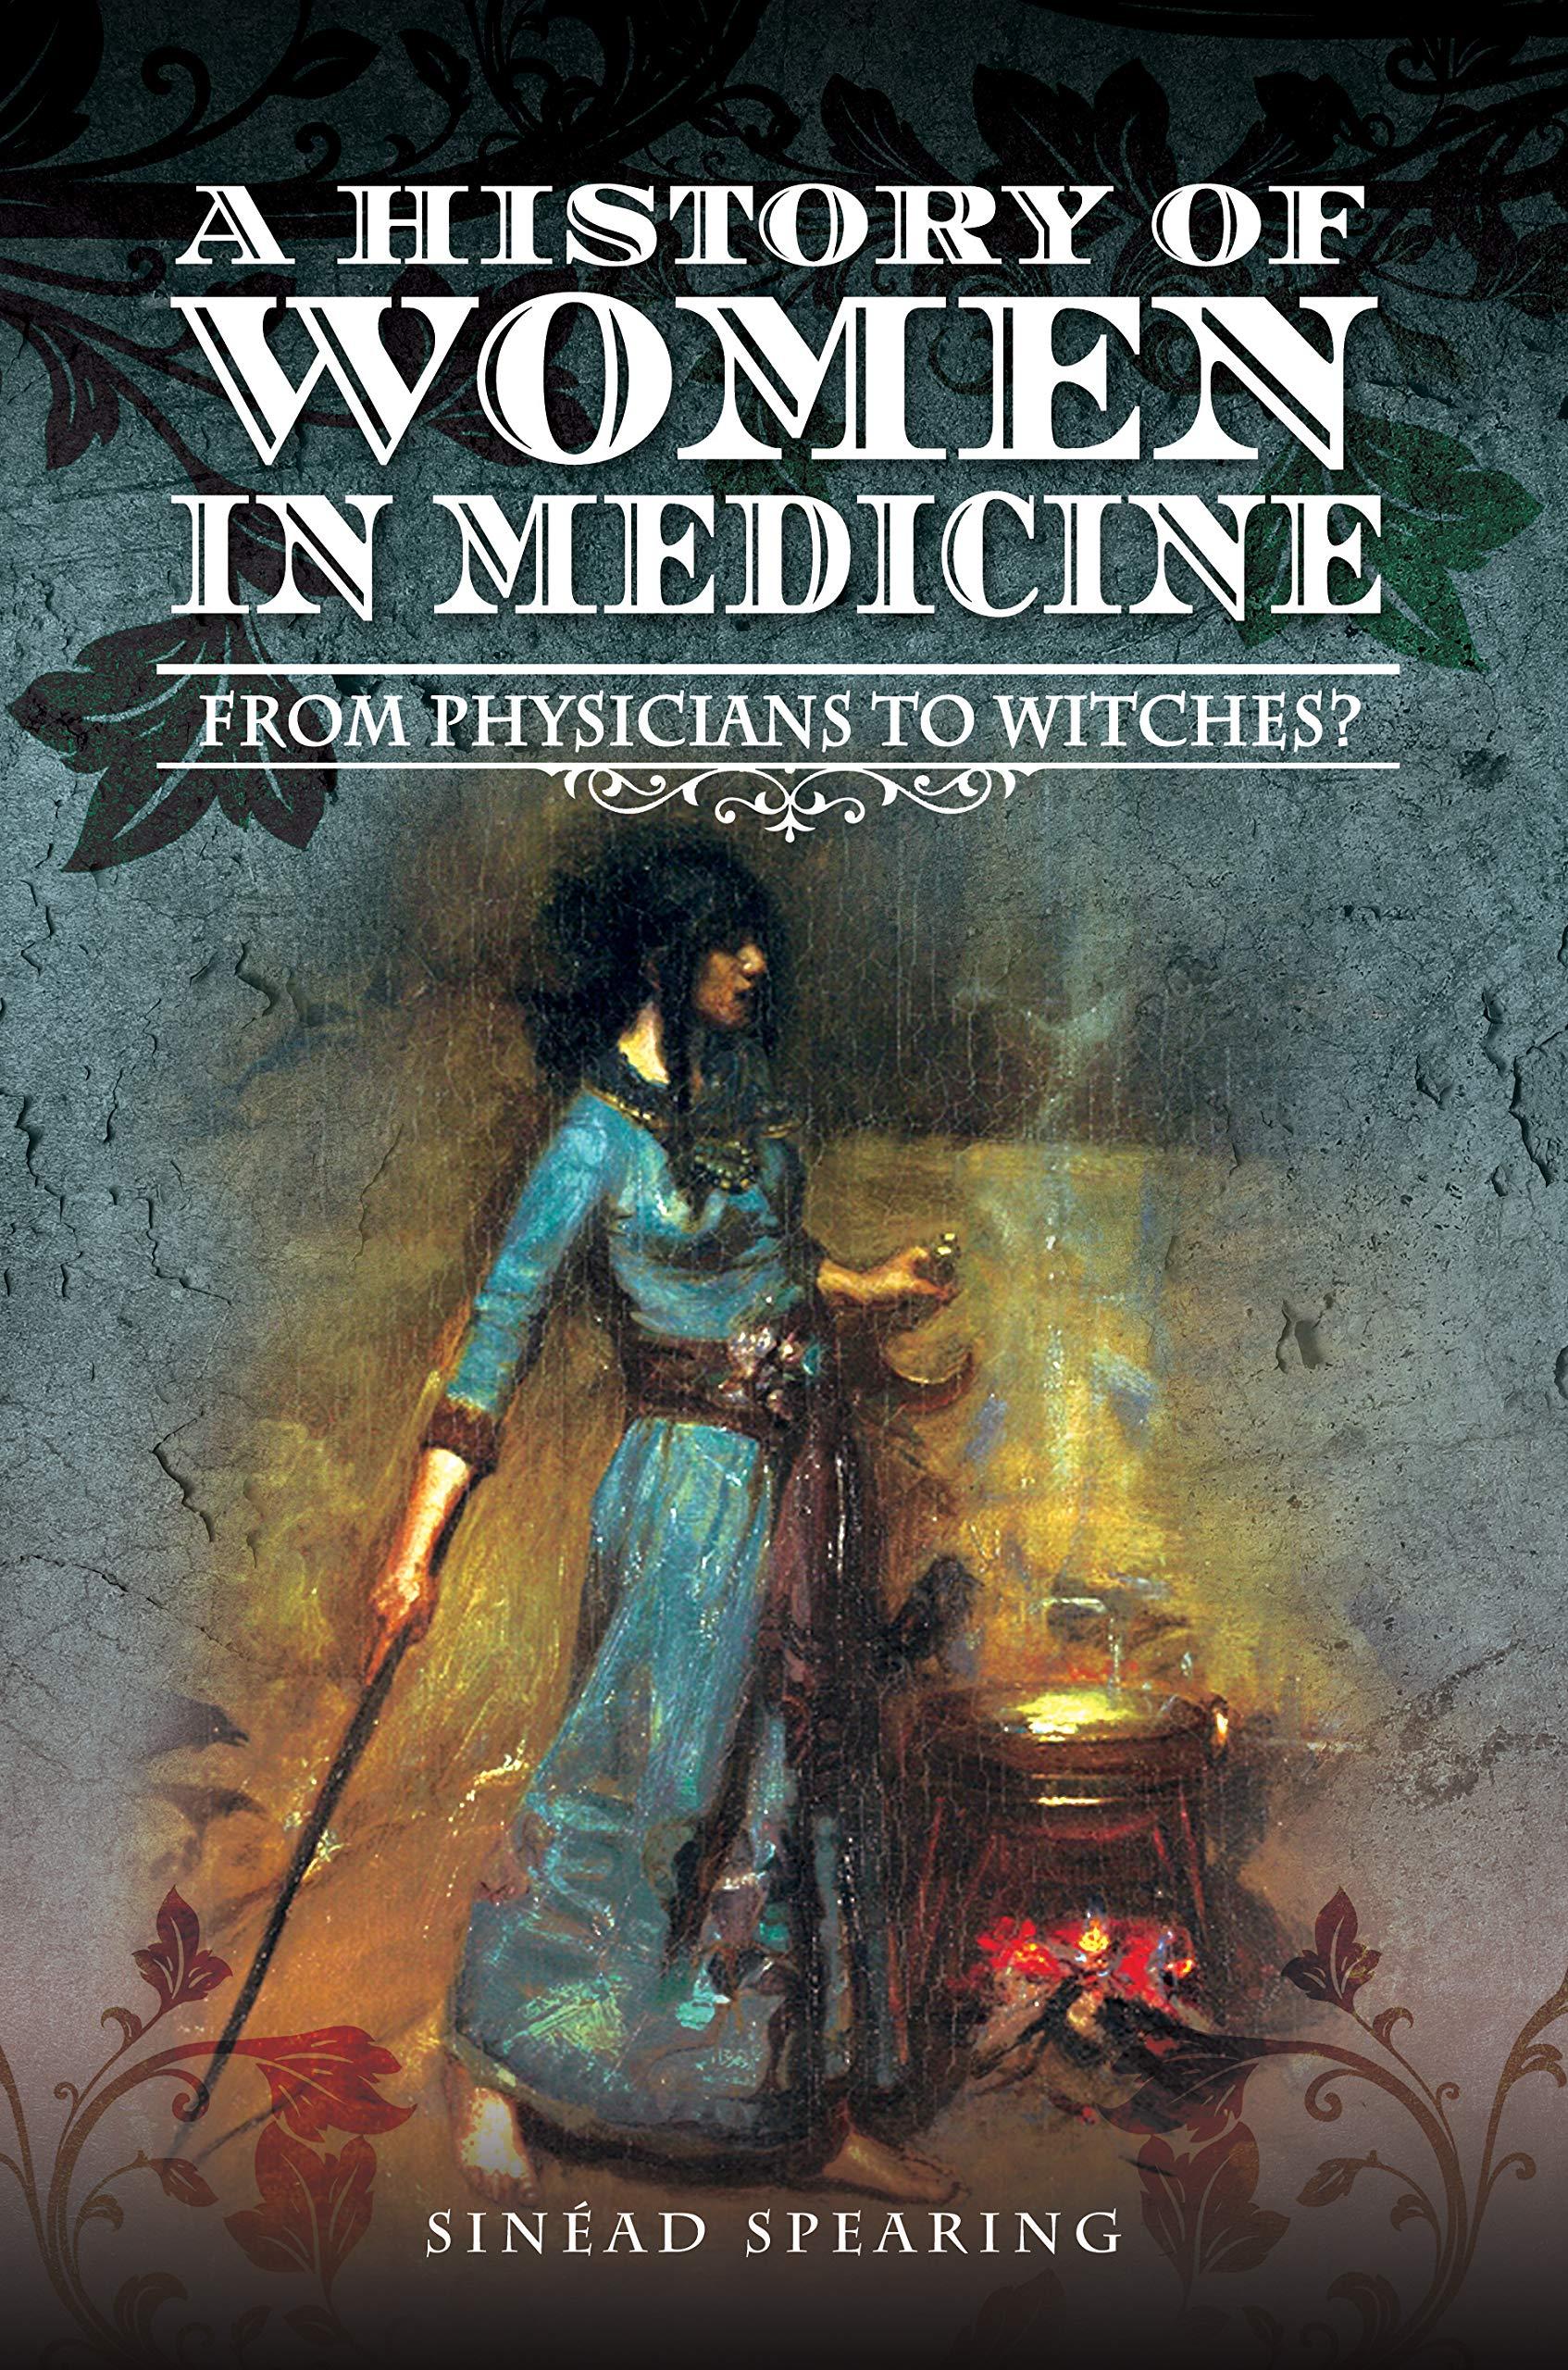 Deliverance/Inner Healing Book List